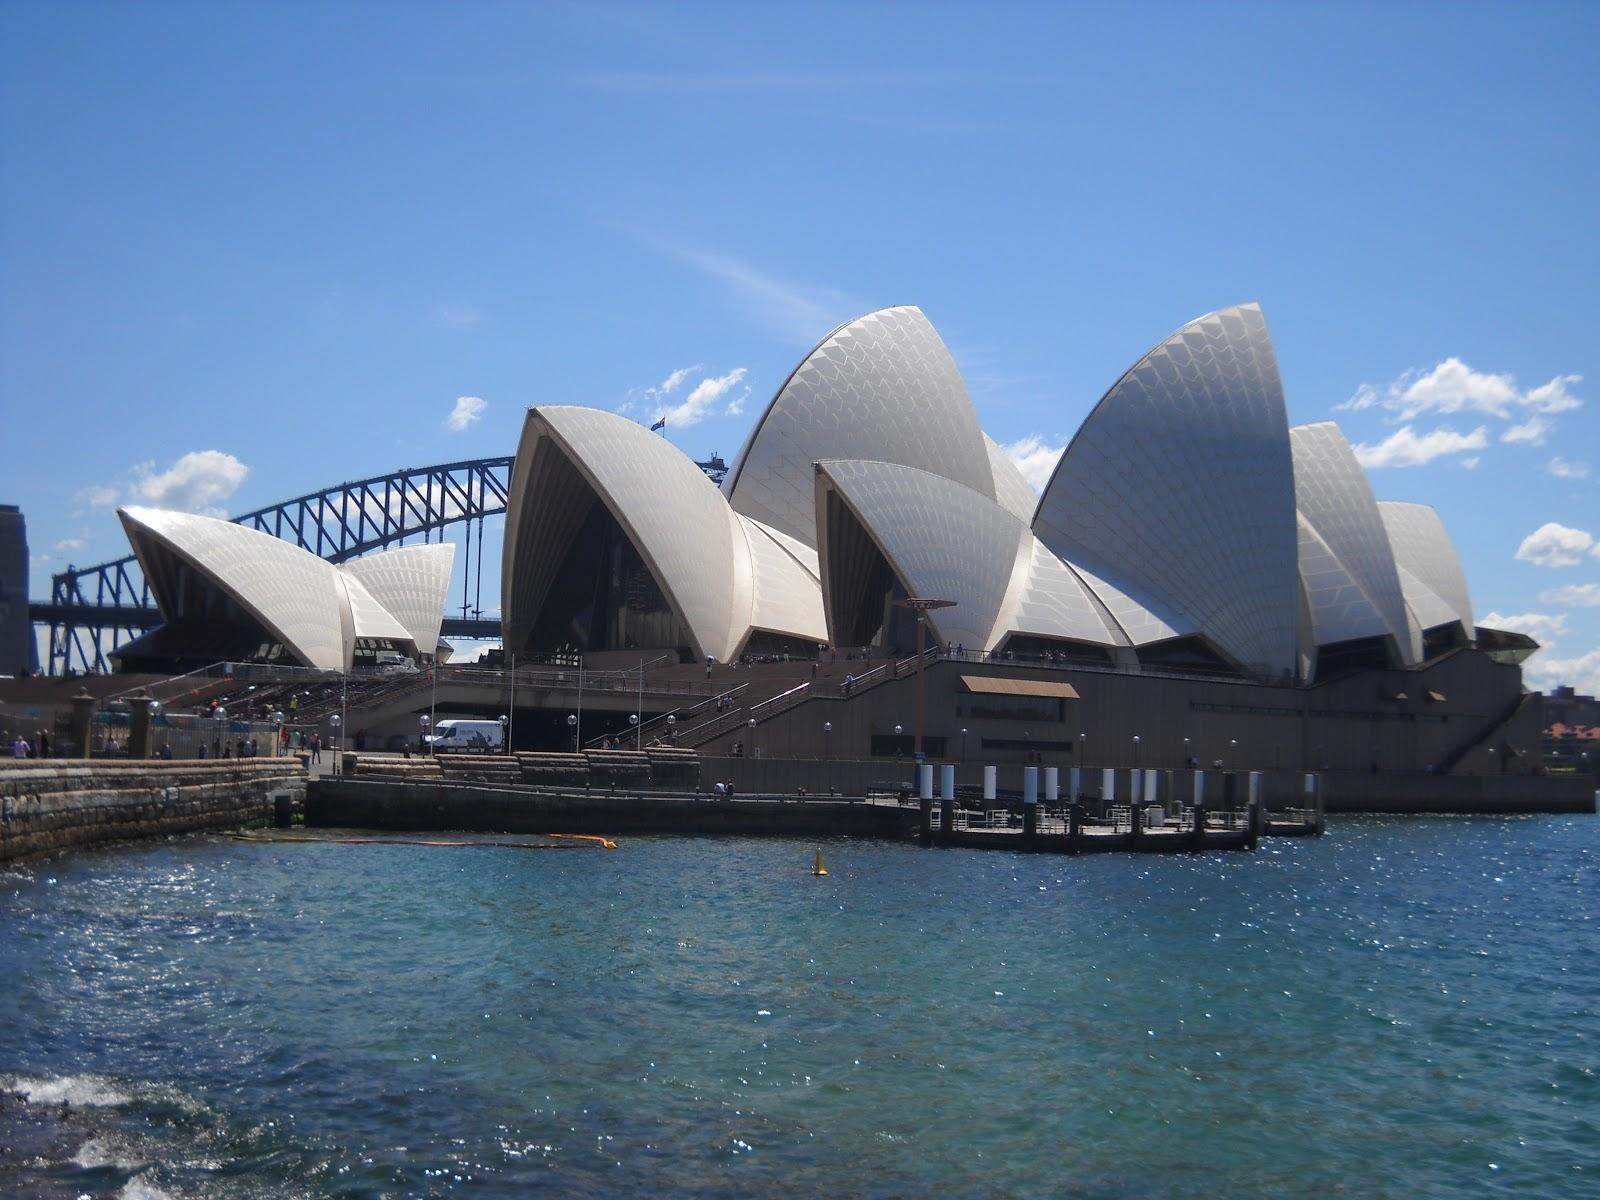 sydney opera house programmes canal plus - photo#3